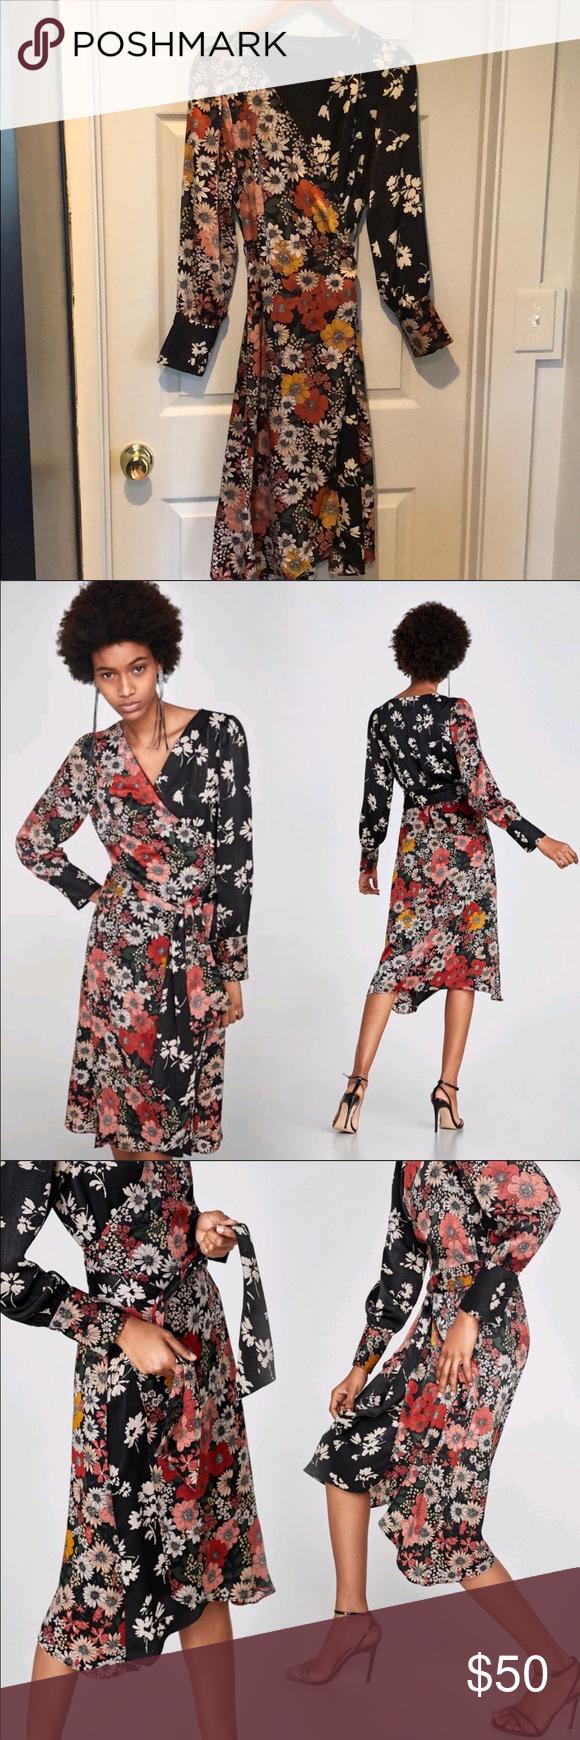 Zara Basic Collection Floral Wrap Midi Dress Zara Basic Dresses Floral Wraps